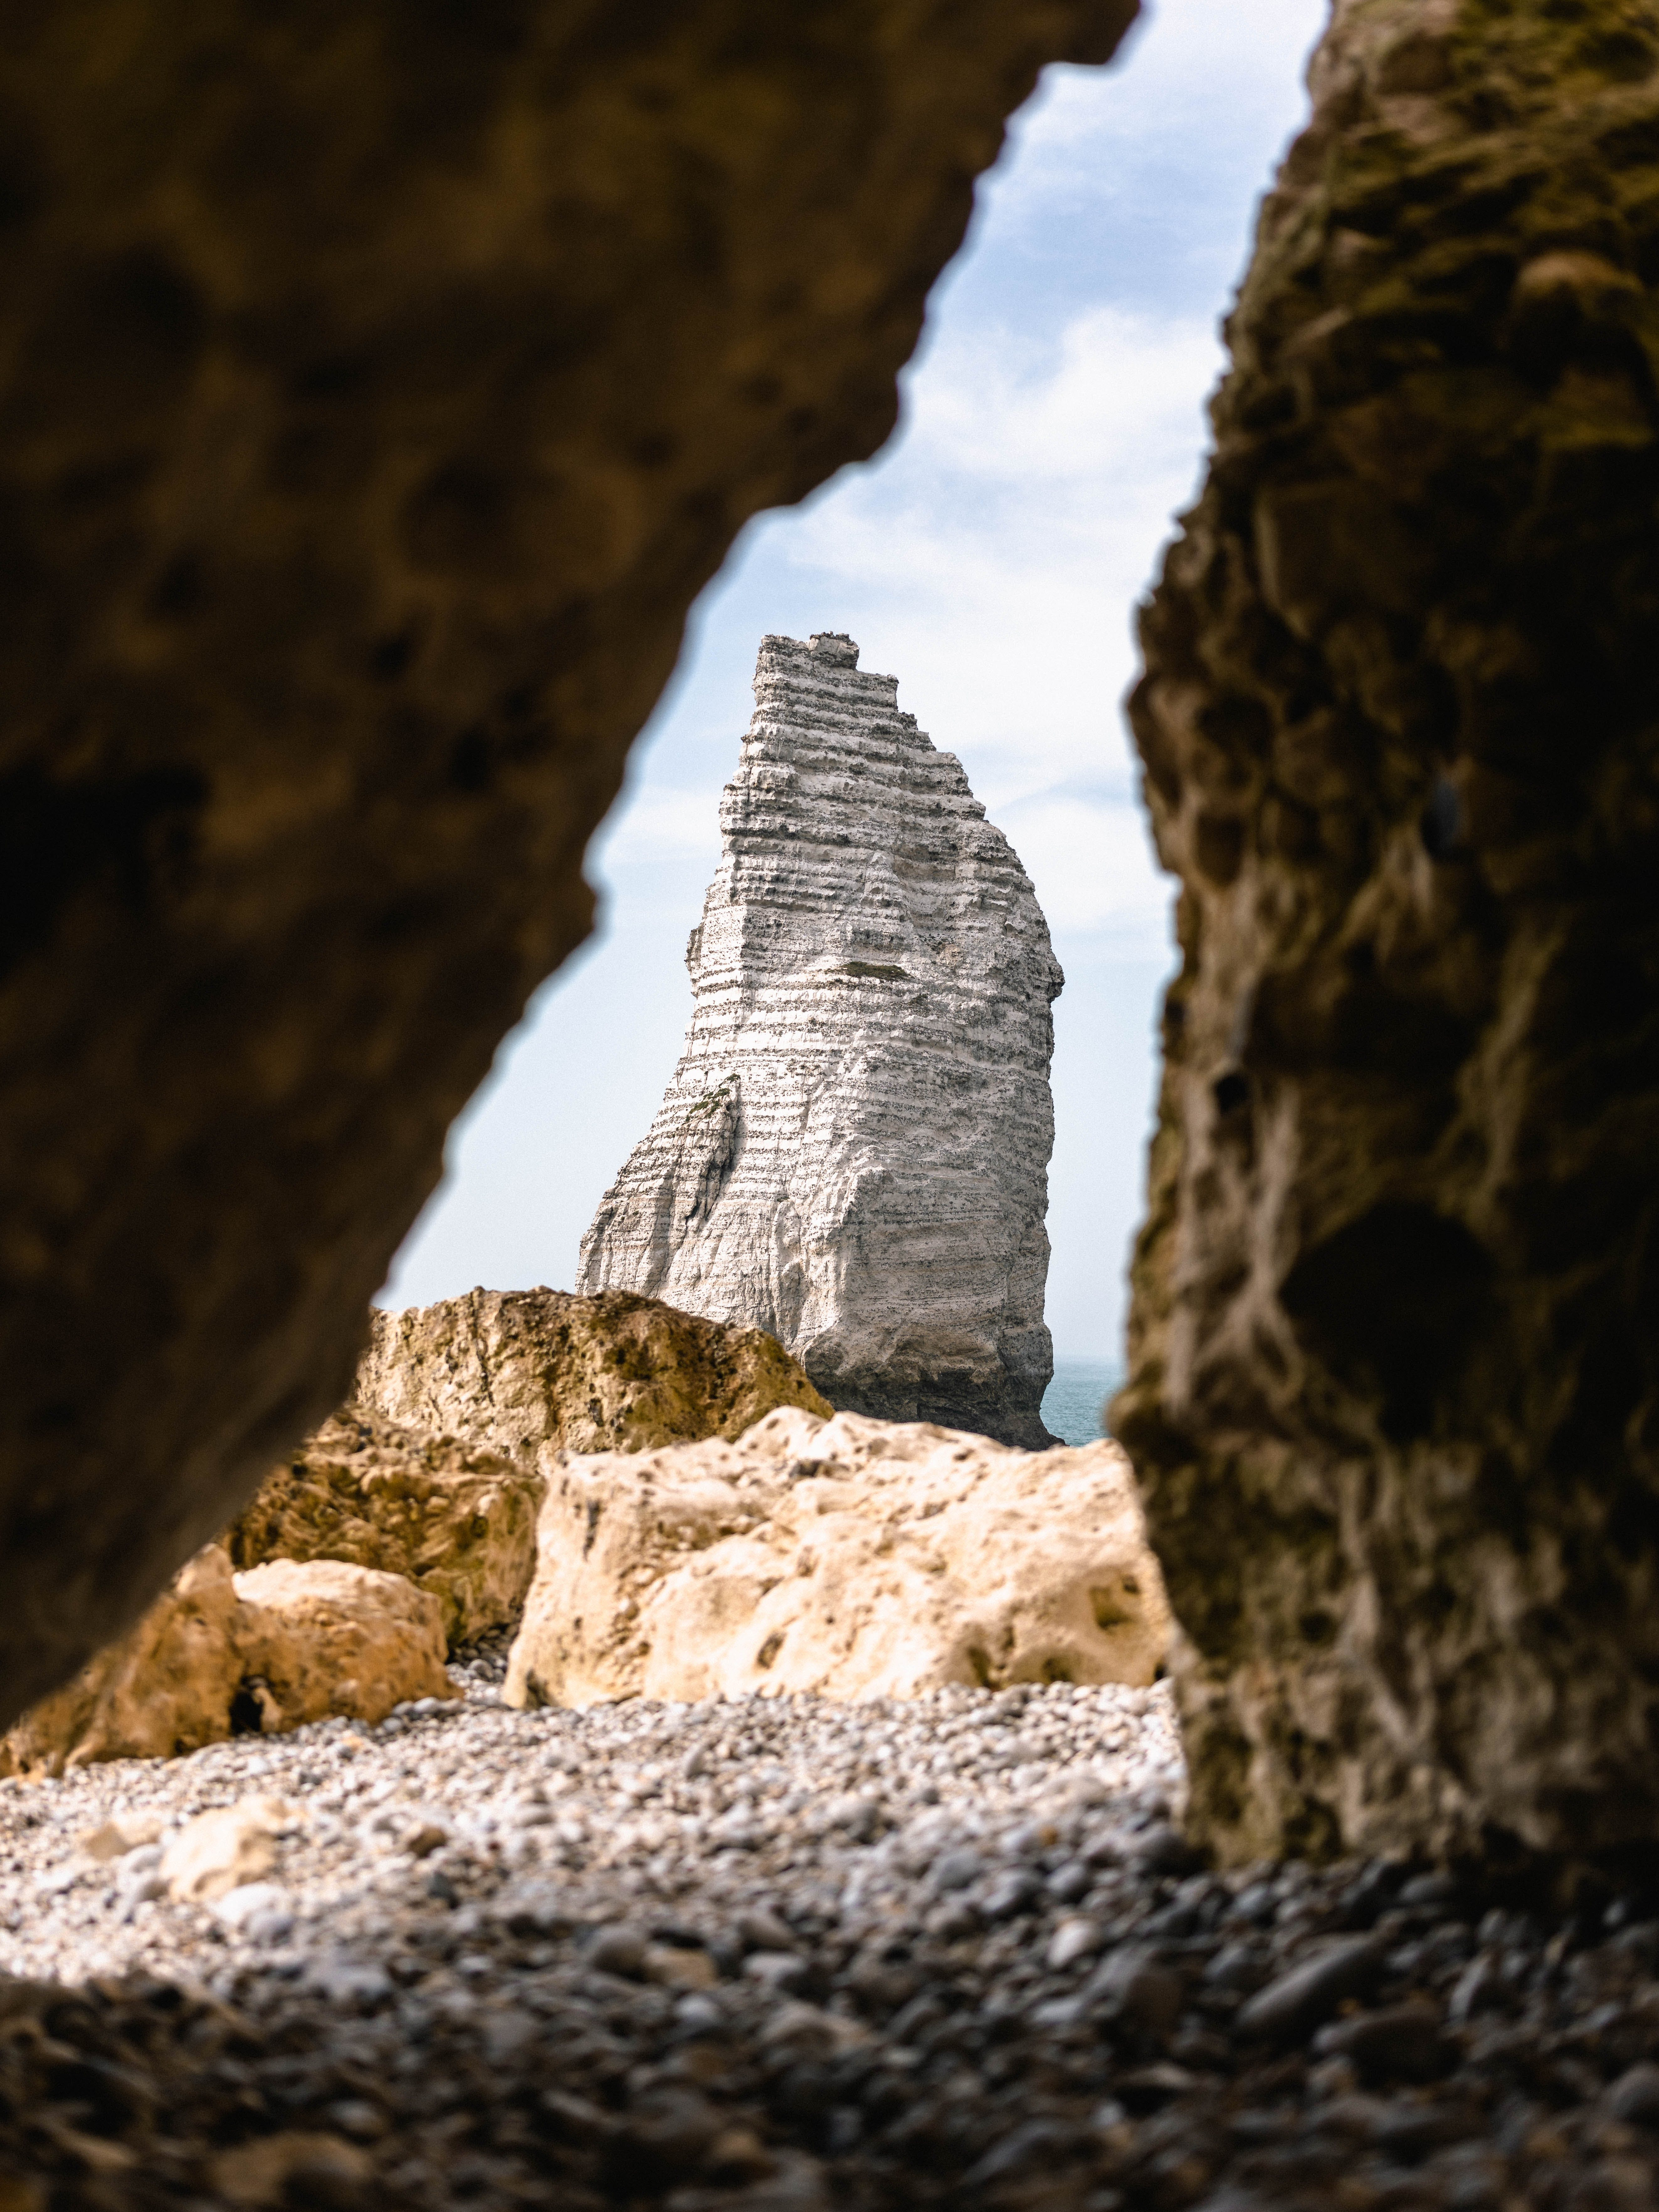 Kostenloses Stock Foto zu berg, erosion, felsen, felsig